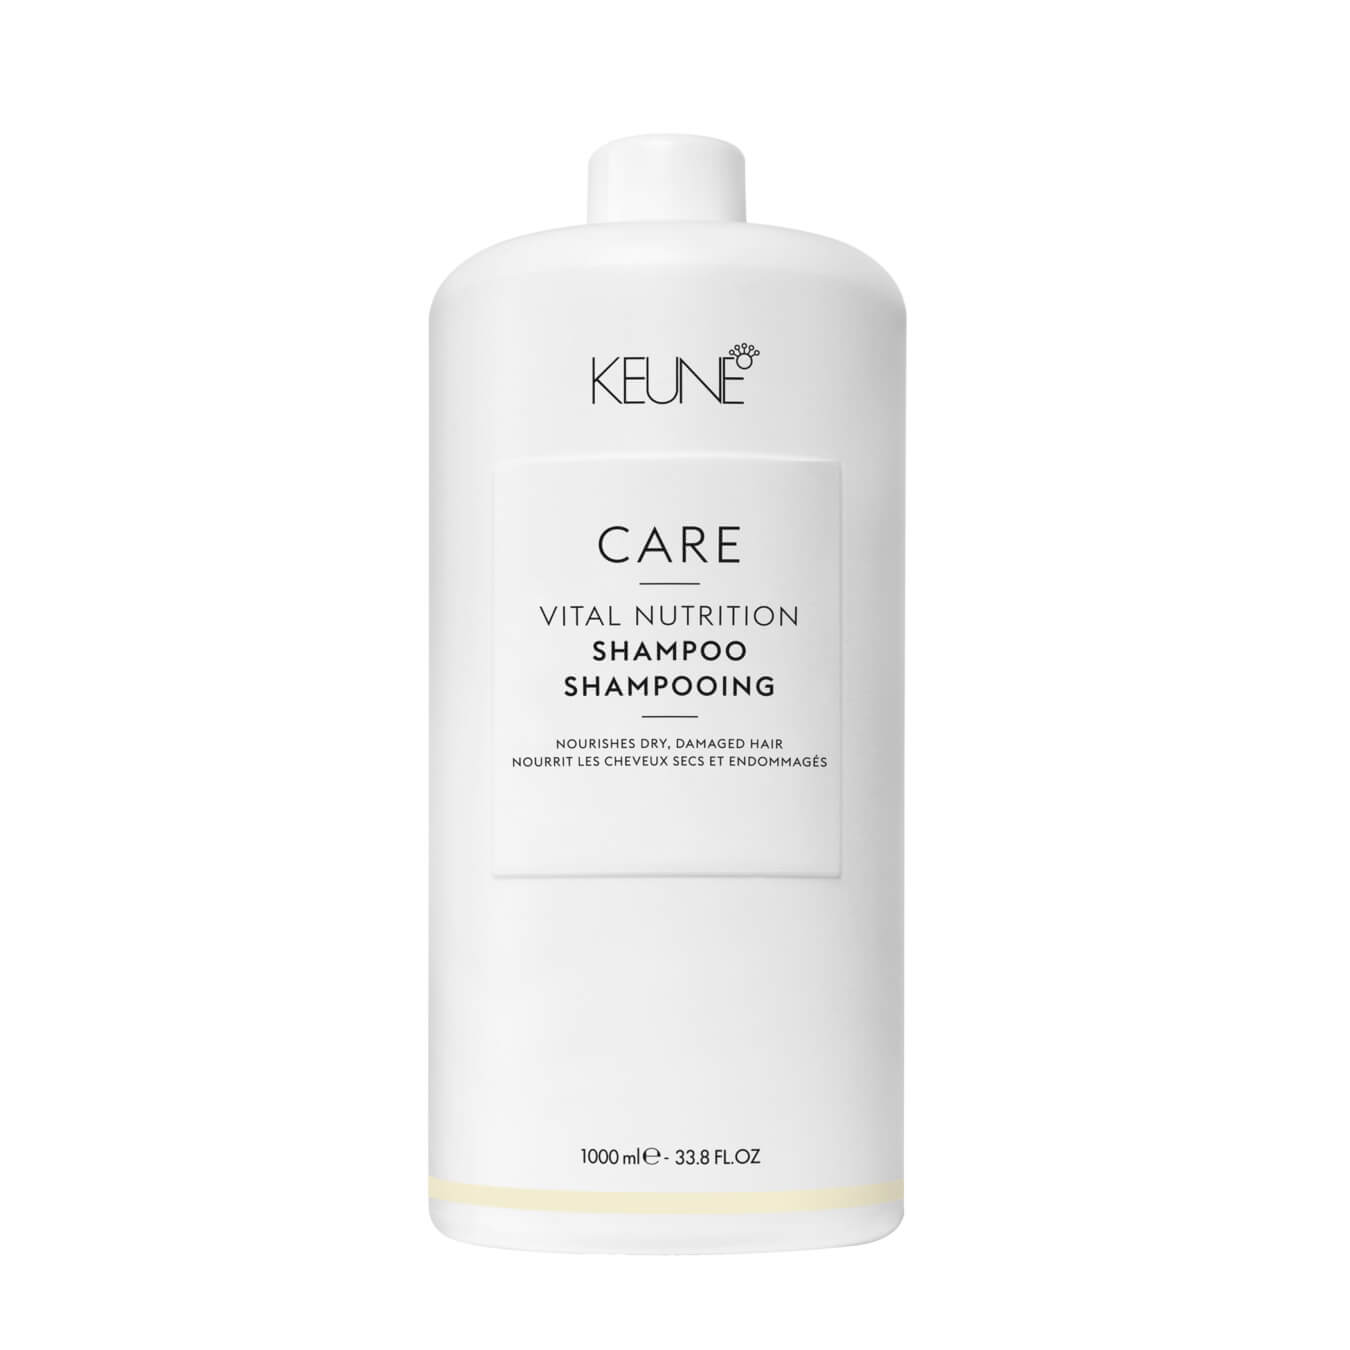 Kauf Keune Care Vital Nutrition Shampoo 1000ml